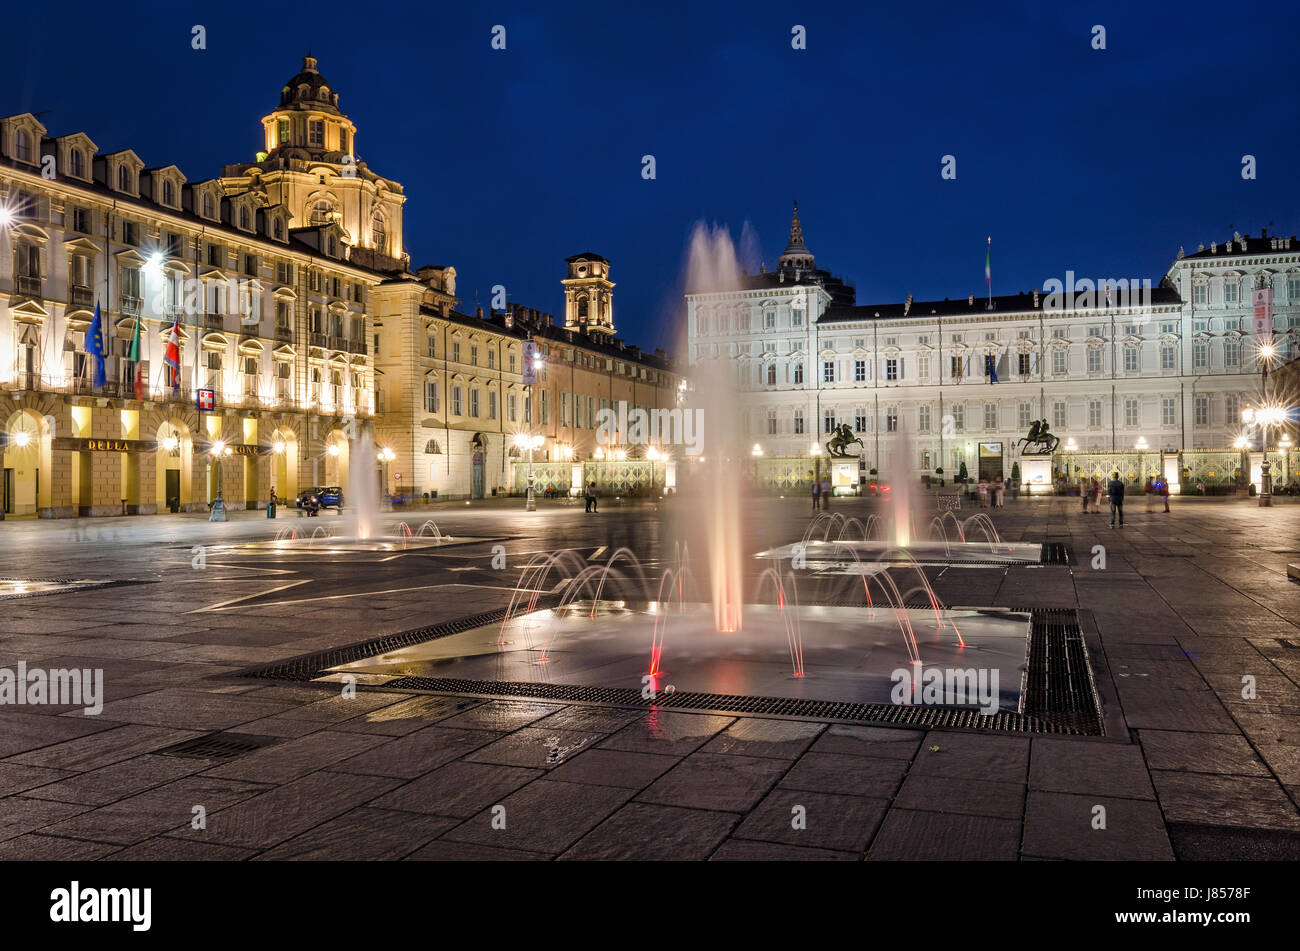 Torino Piazza Castello con fuente en primer plano al atardecer Foto de stock